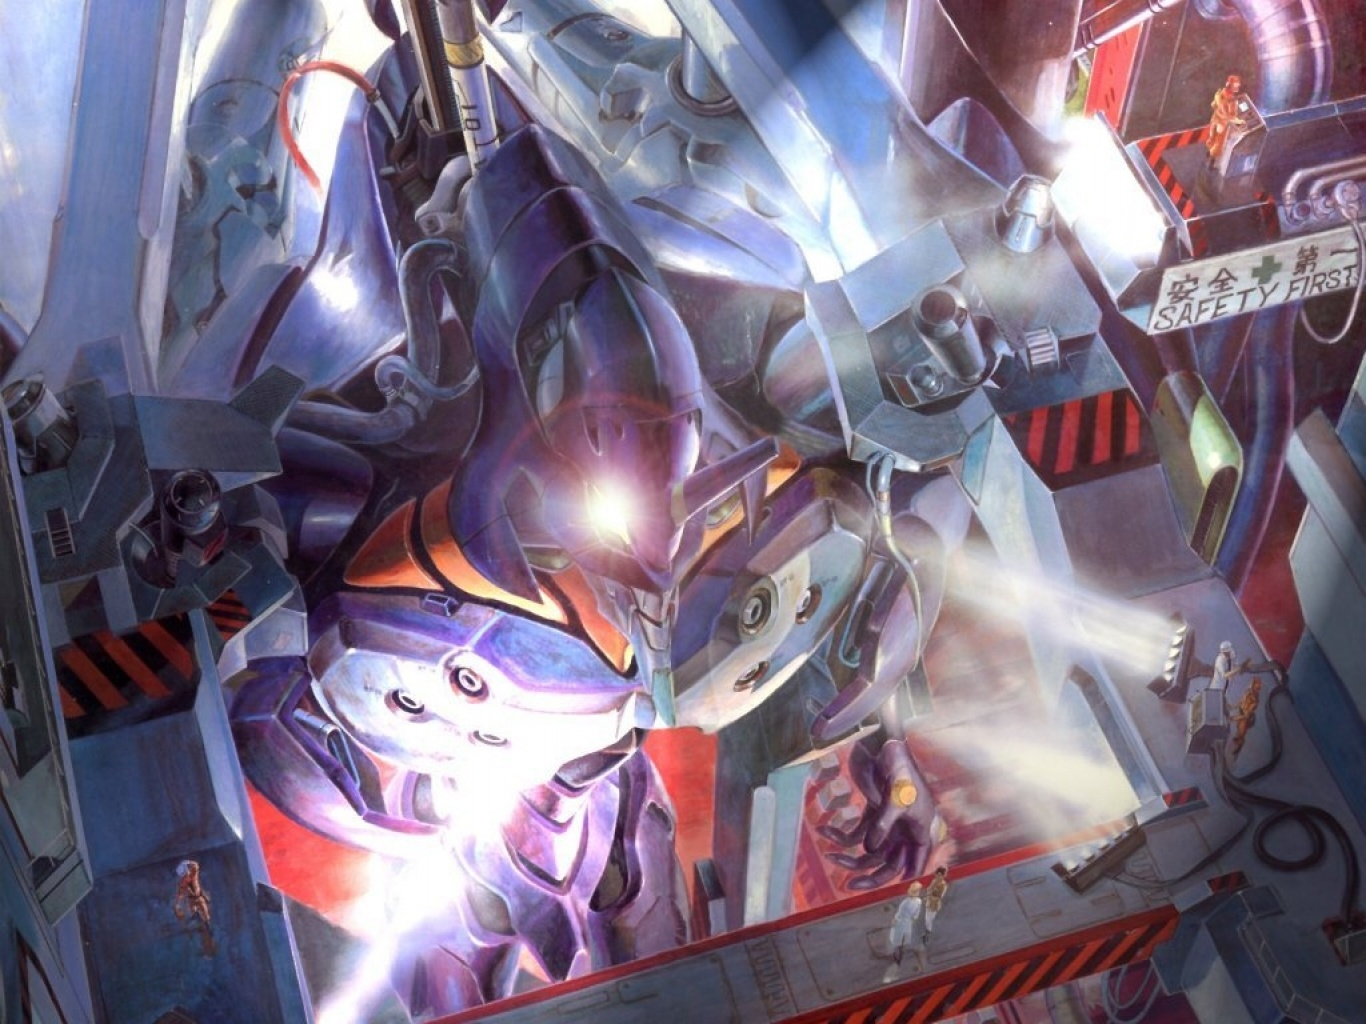 Anime Unidad Evangelion 720569 Wallpaper wallpaper